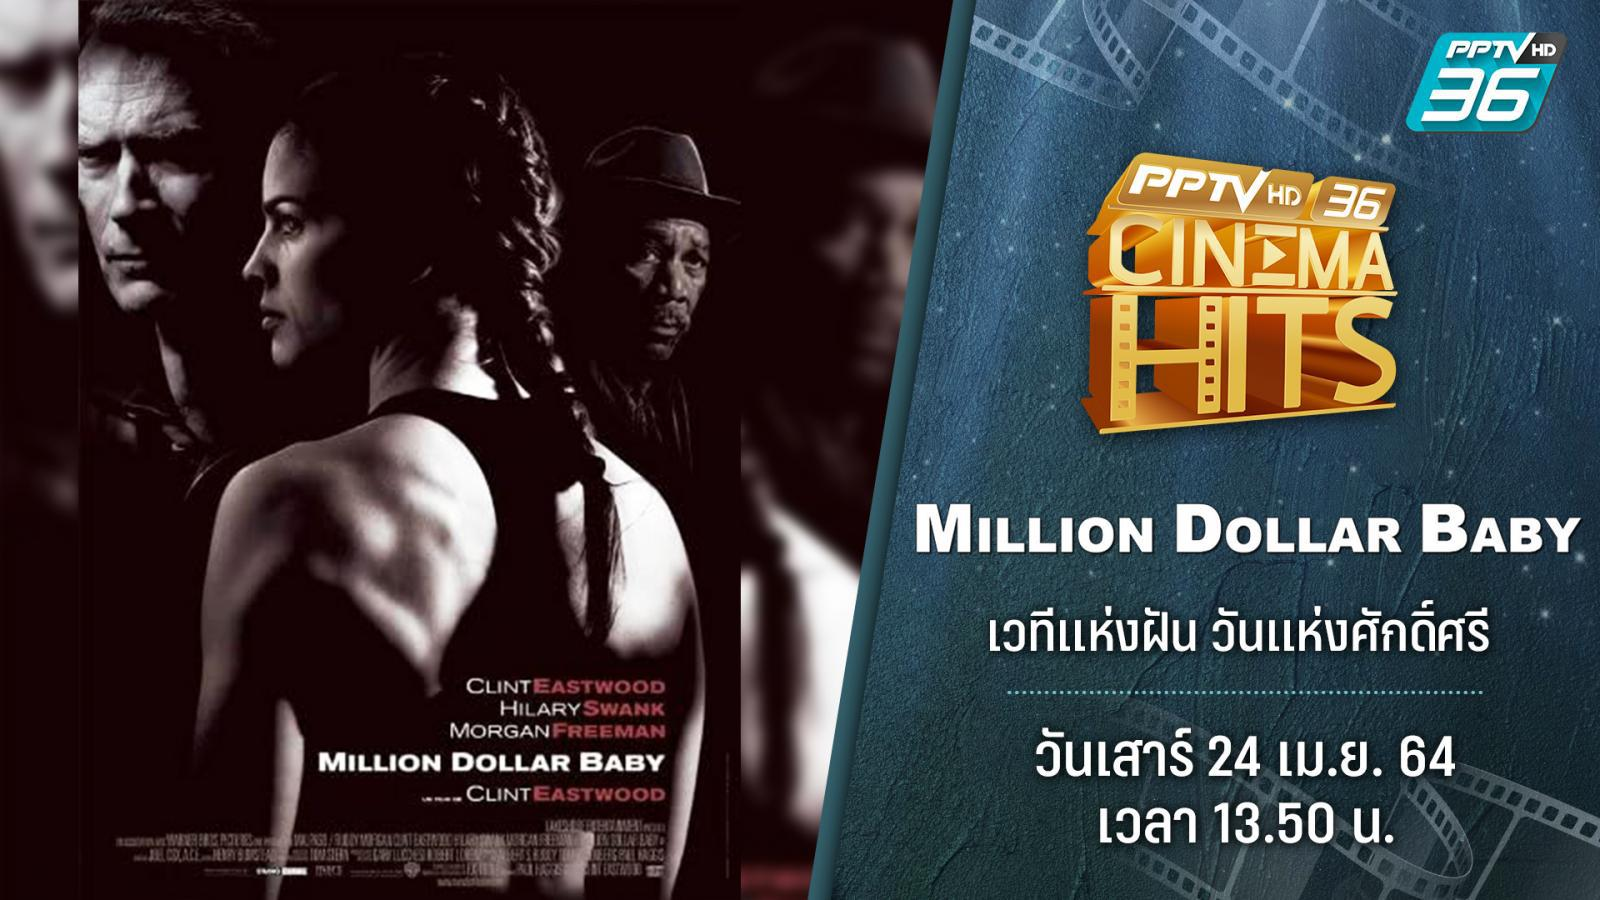 Million Dollar Baby เวทีแห่งฝัน วันแห่งศักดิ์ศรี